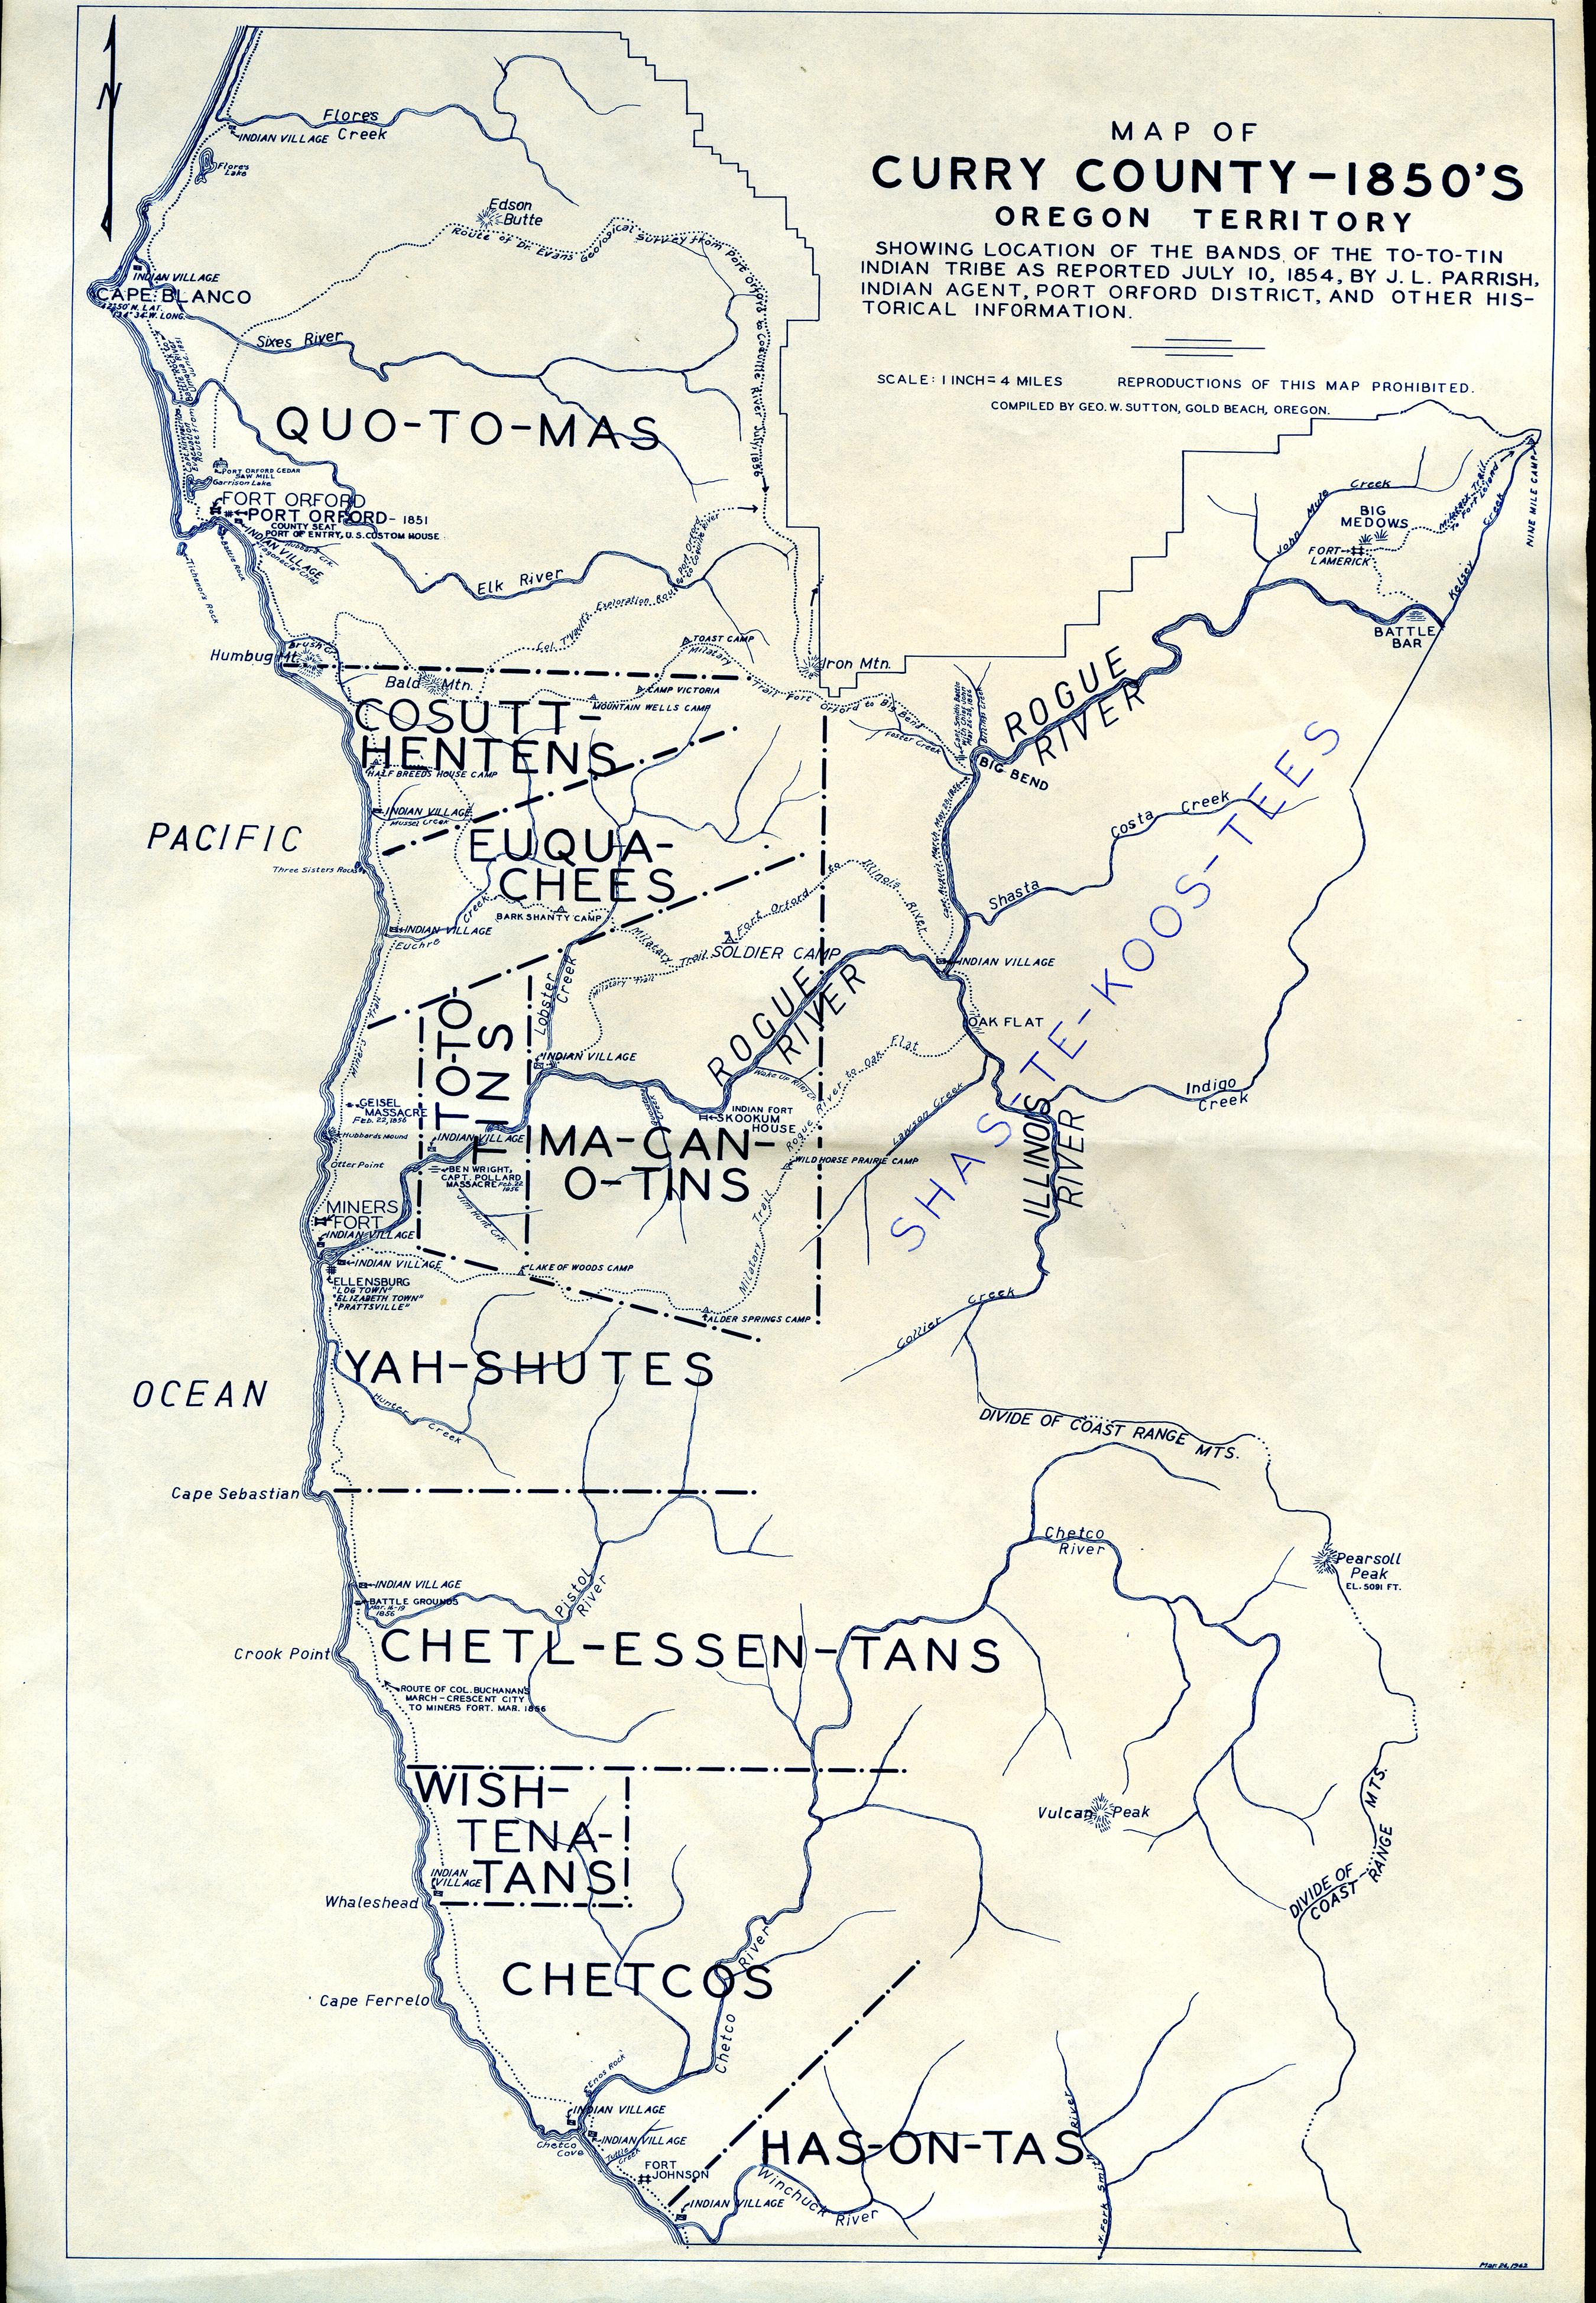 Gallery of Oregon Maps